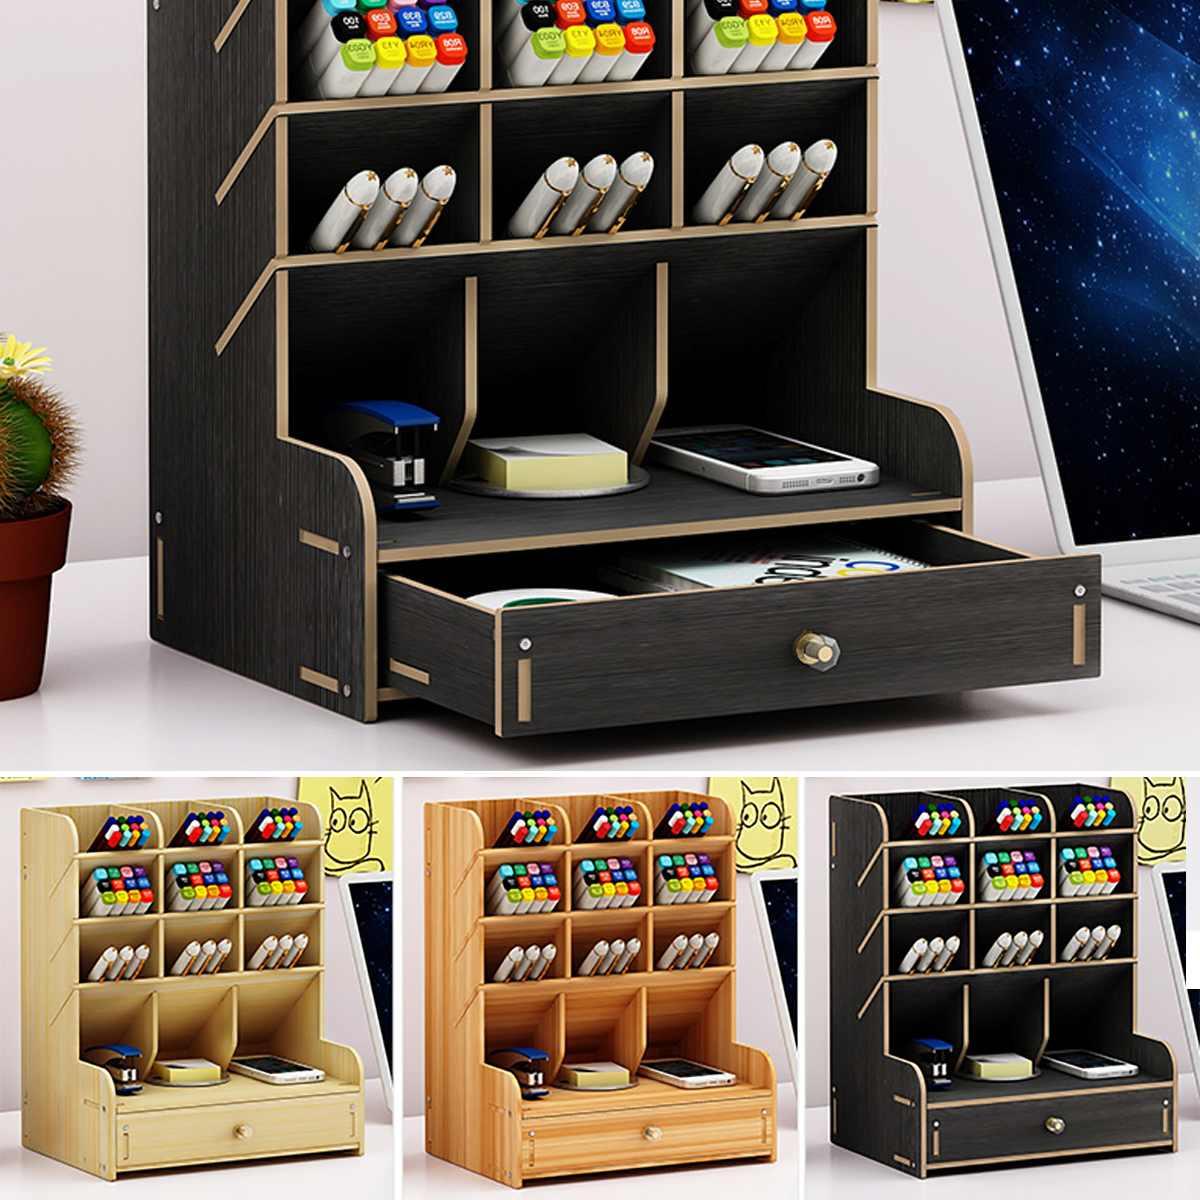 Wooden Desk Organizer Multi-Functional DIY Pen Holder Box Desktop Stationary Home Office Supply Storage Rack